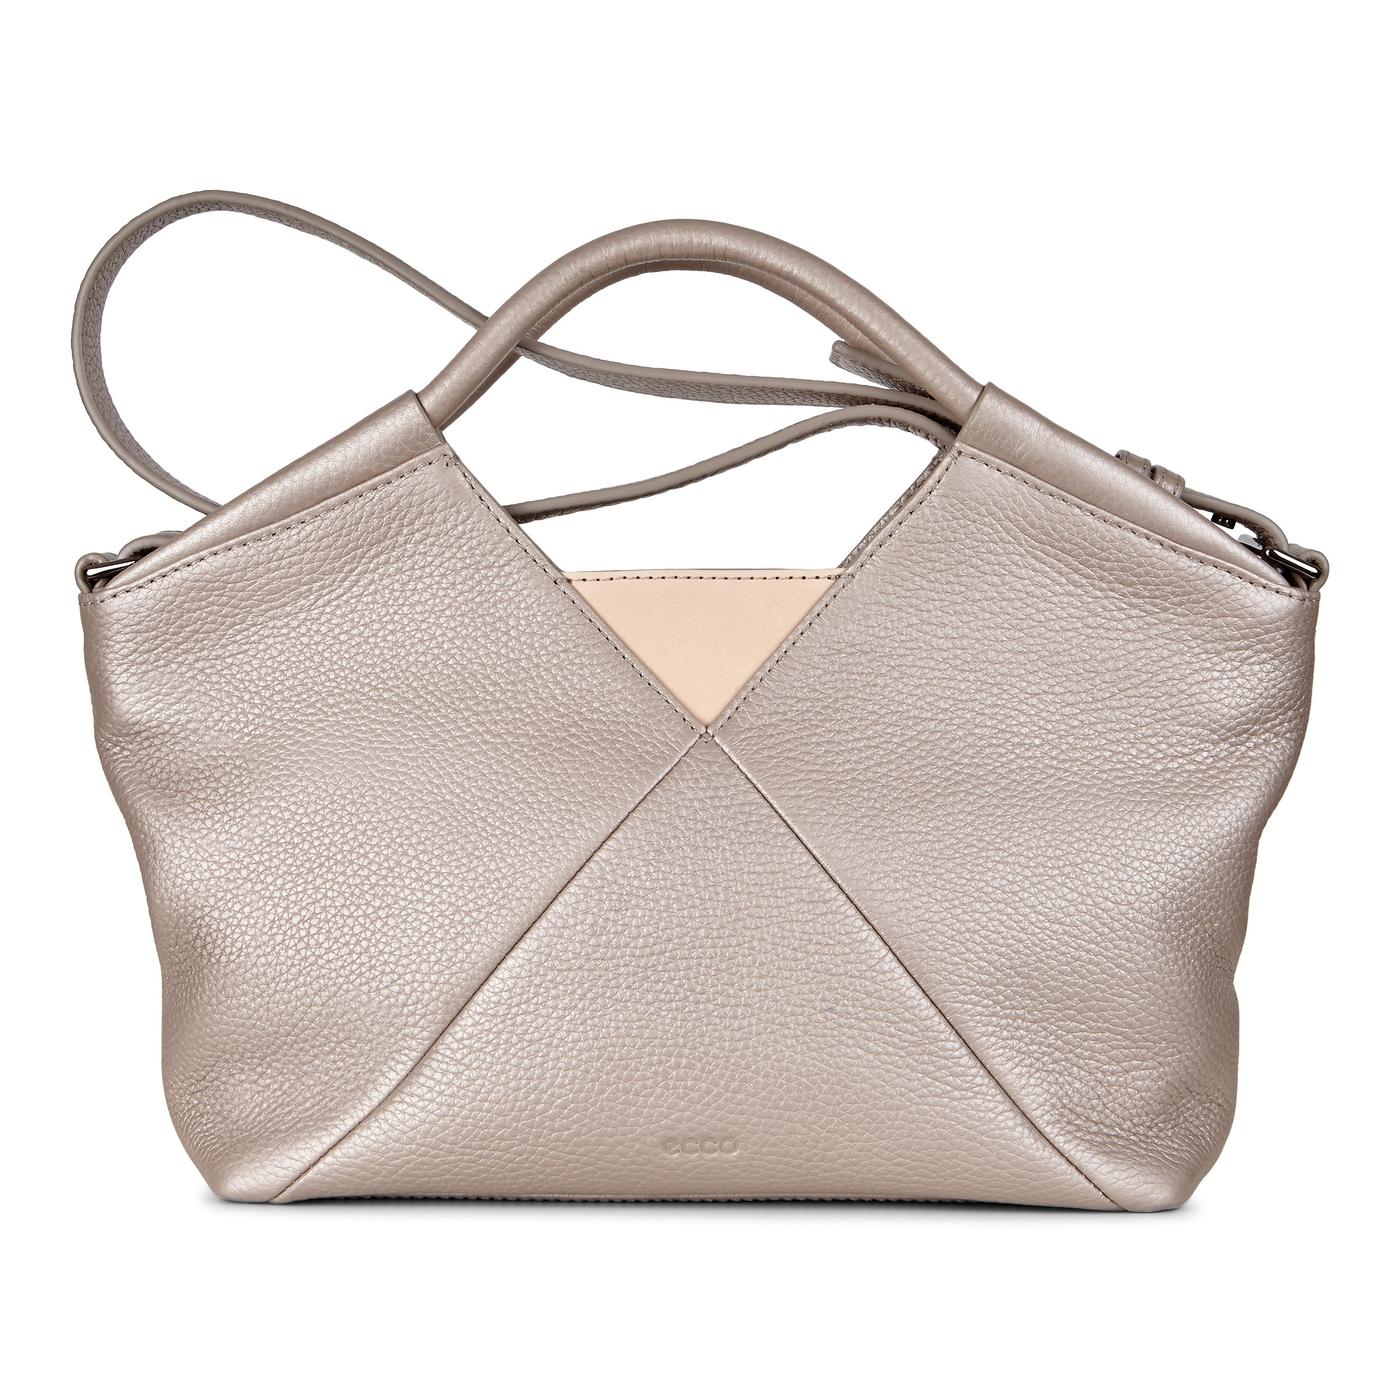 ECCO LINNEA Metallic Small Work Bag